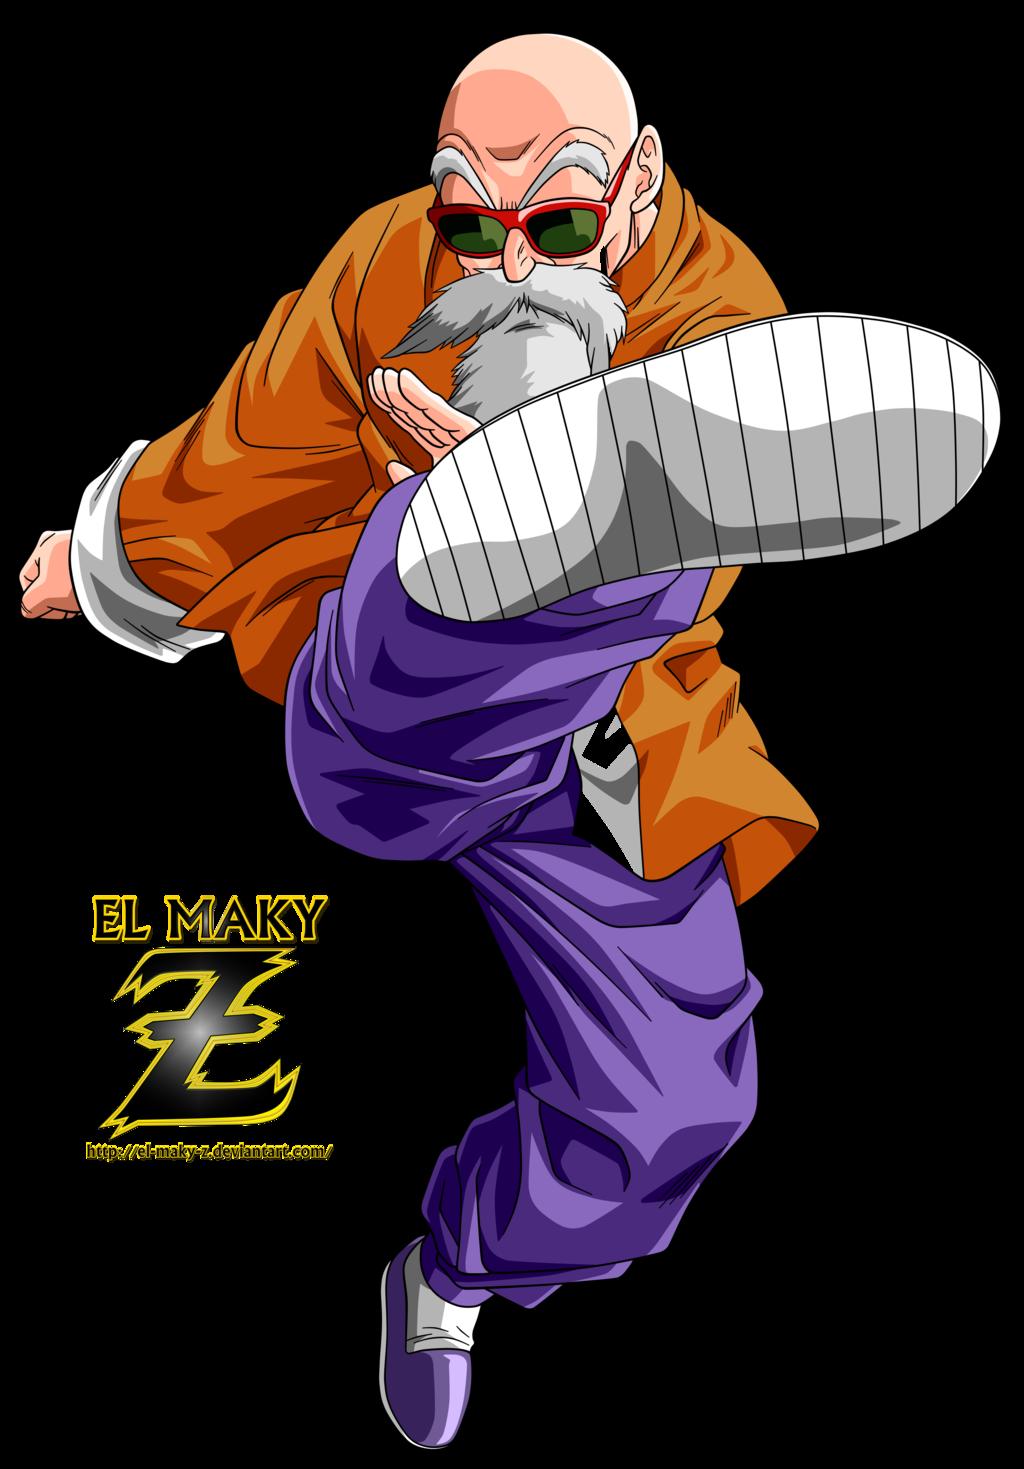 Master Roshi Anime Dragon Ball Super Dragon Ball Artwork Dragon Ball Art